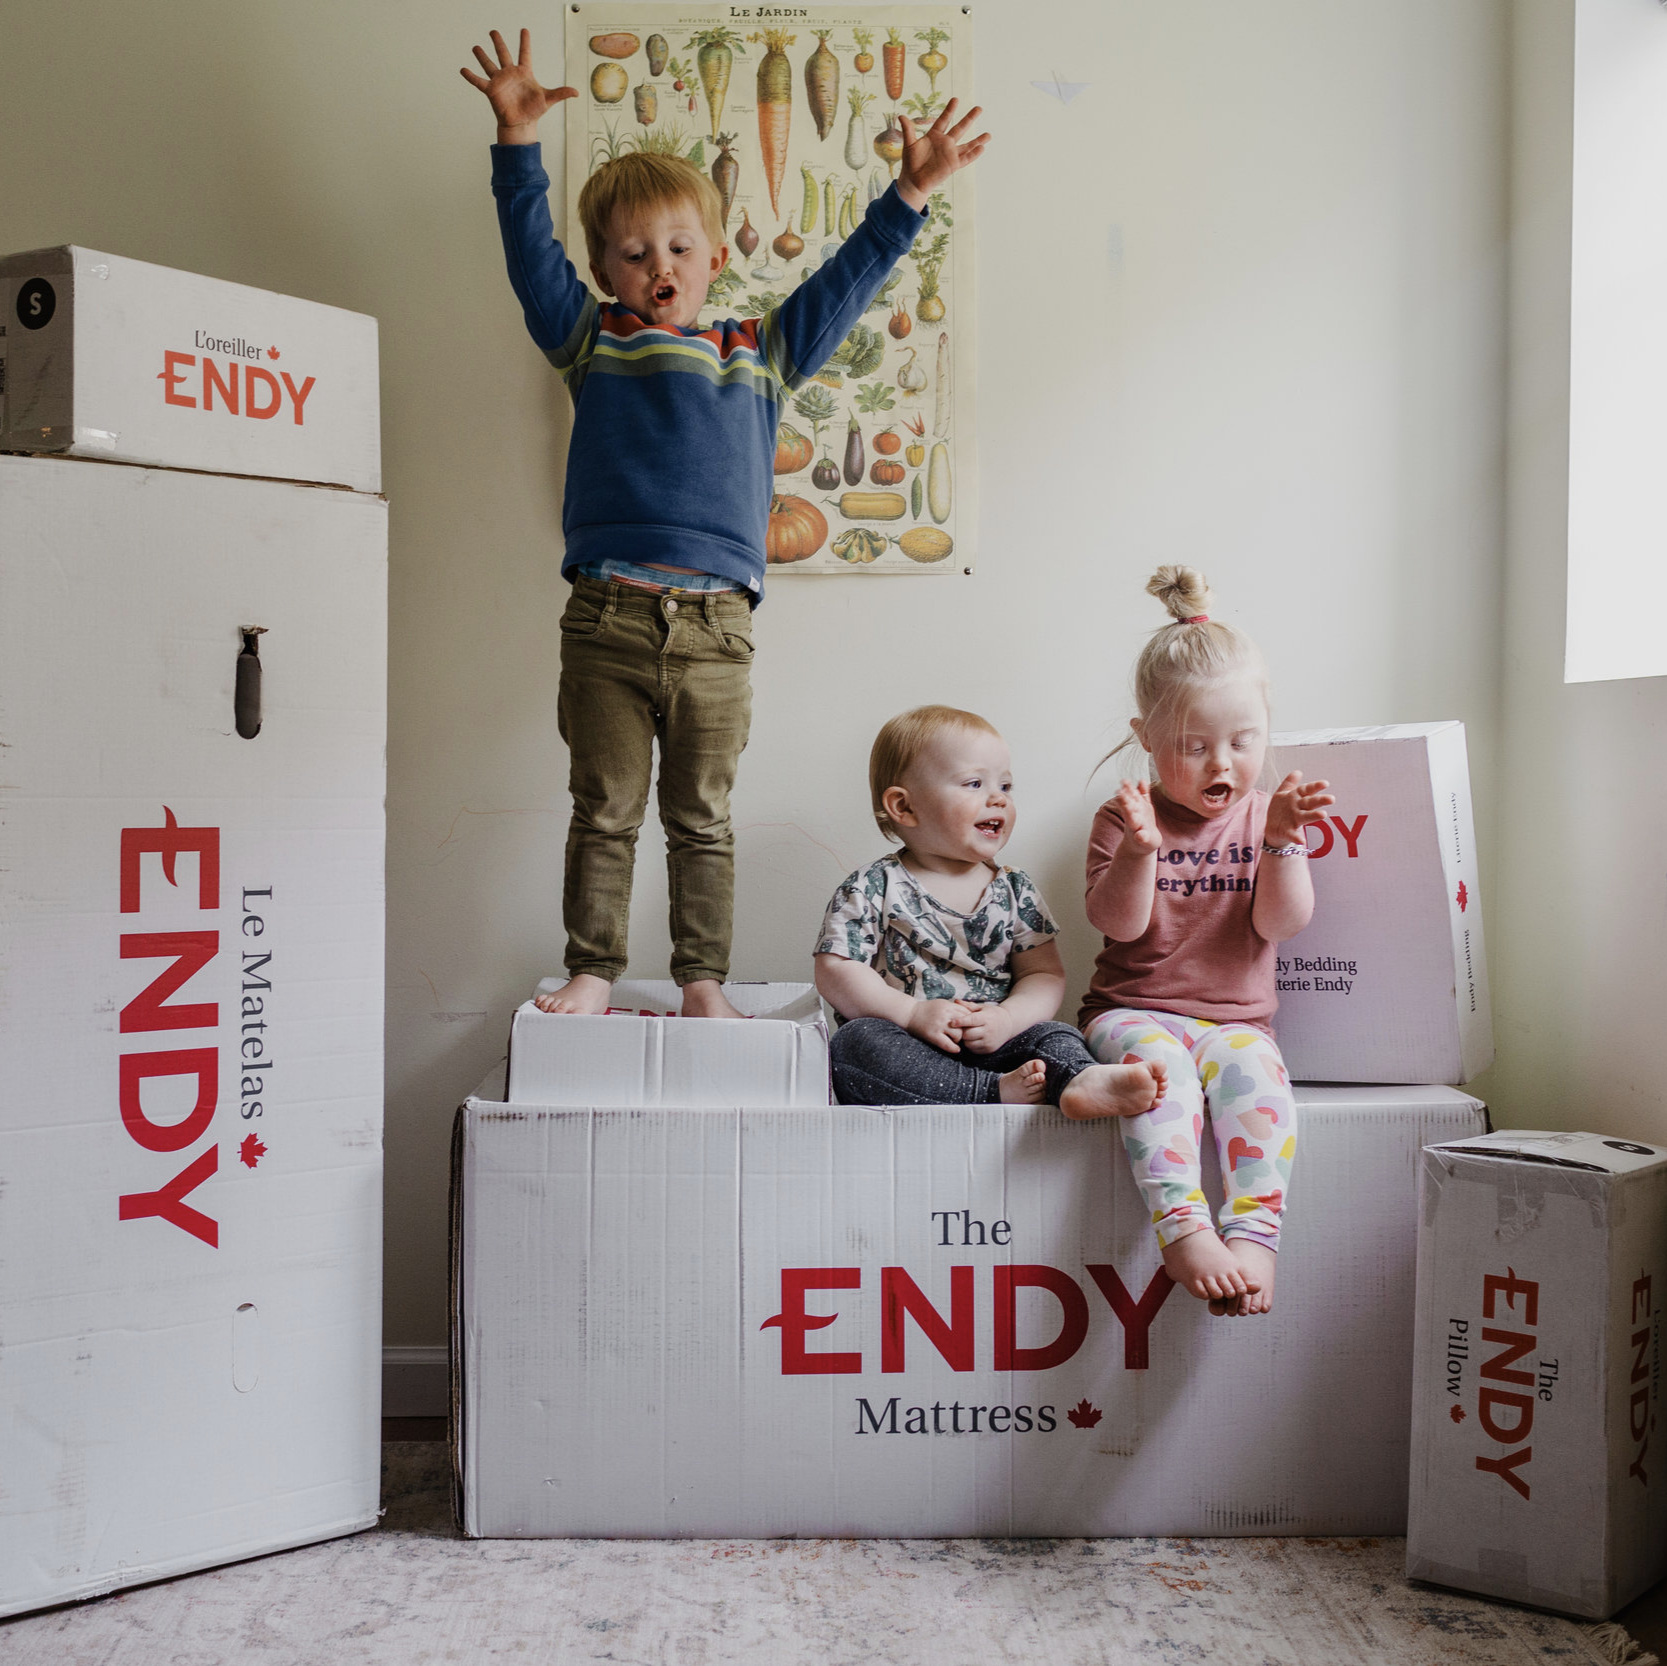 ENDY - Mattresses